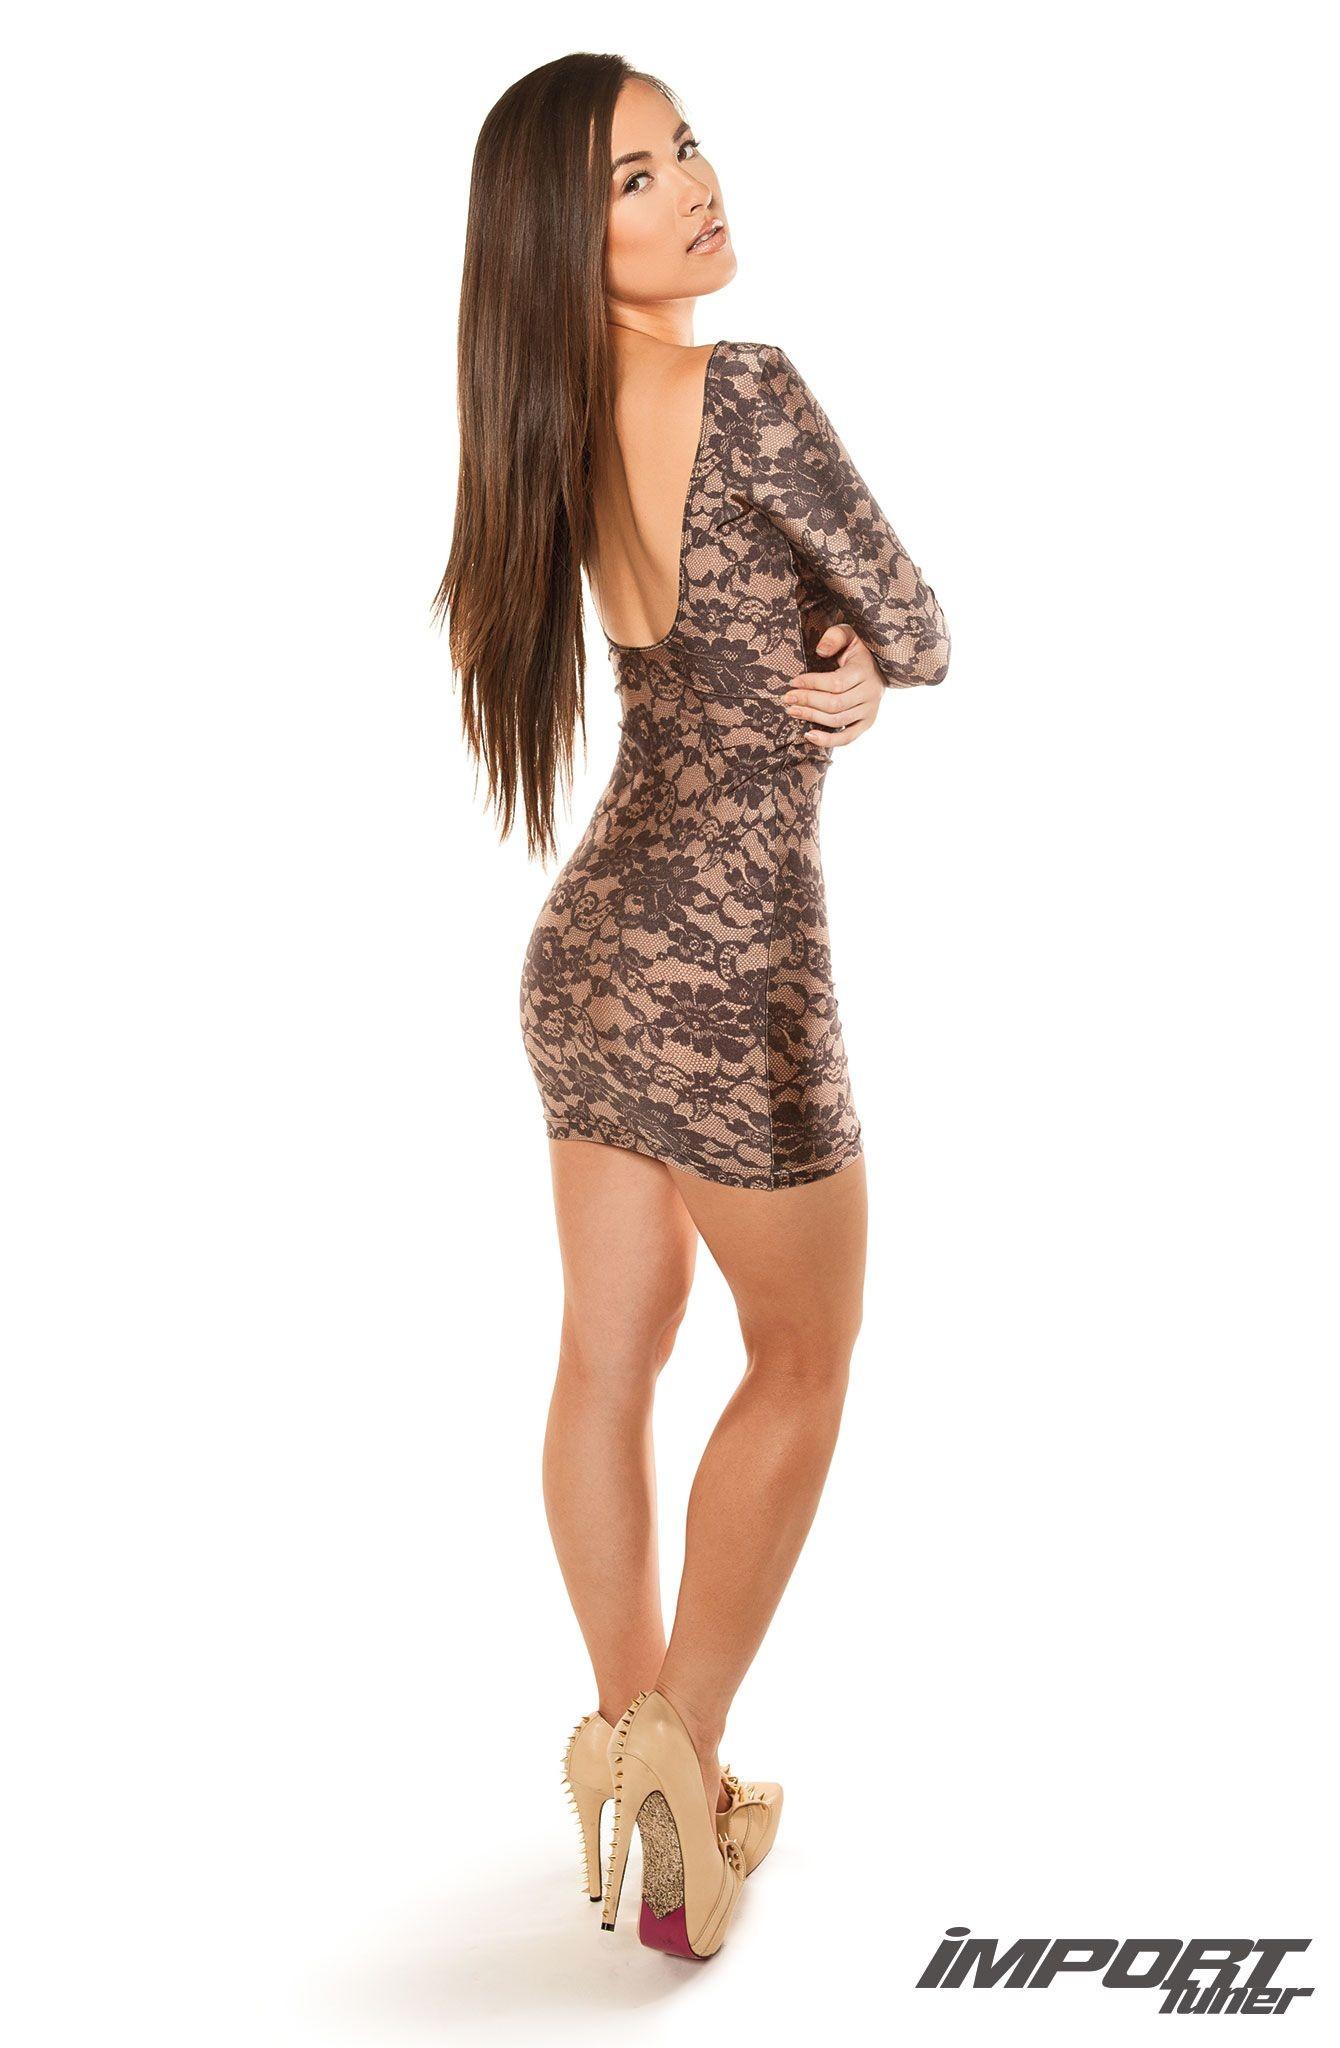 Hintergrundbilder : Frau, Modell-, Brünette, Kleid, Muster, Kleidung ...